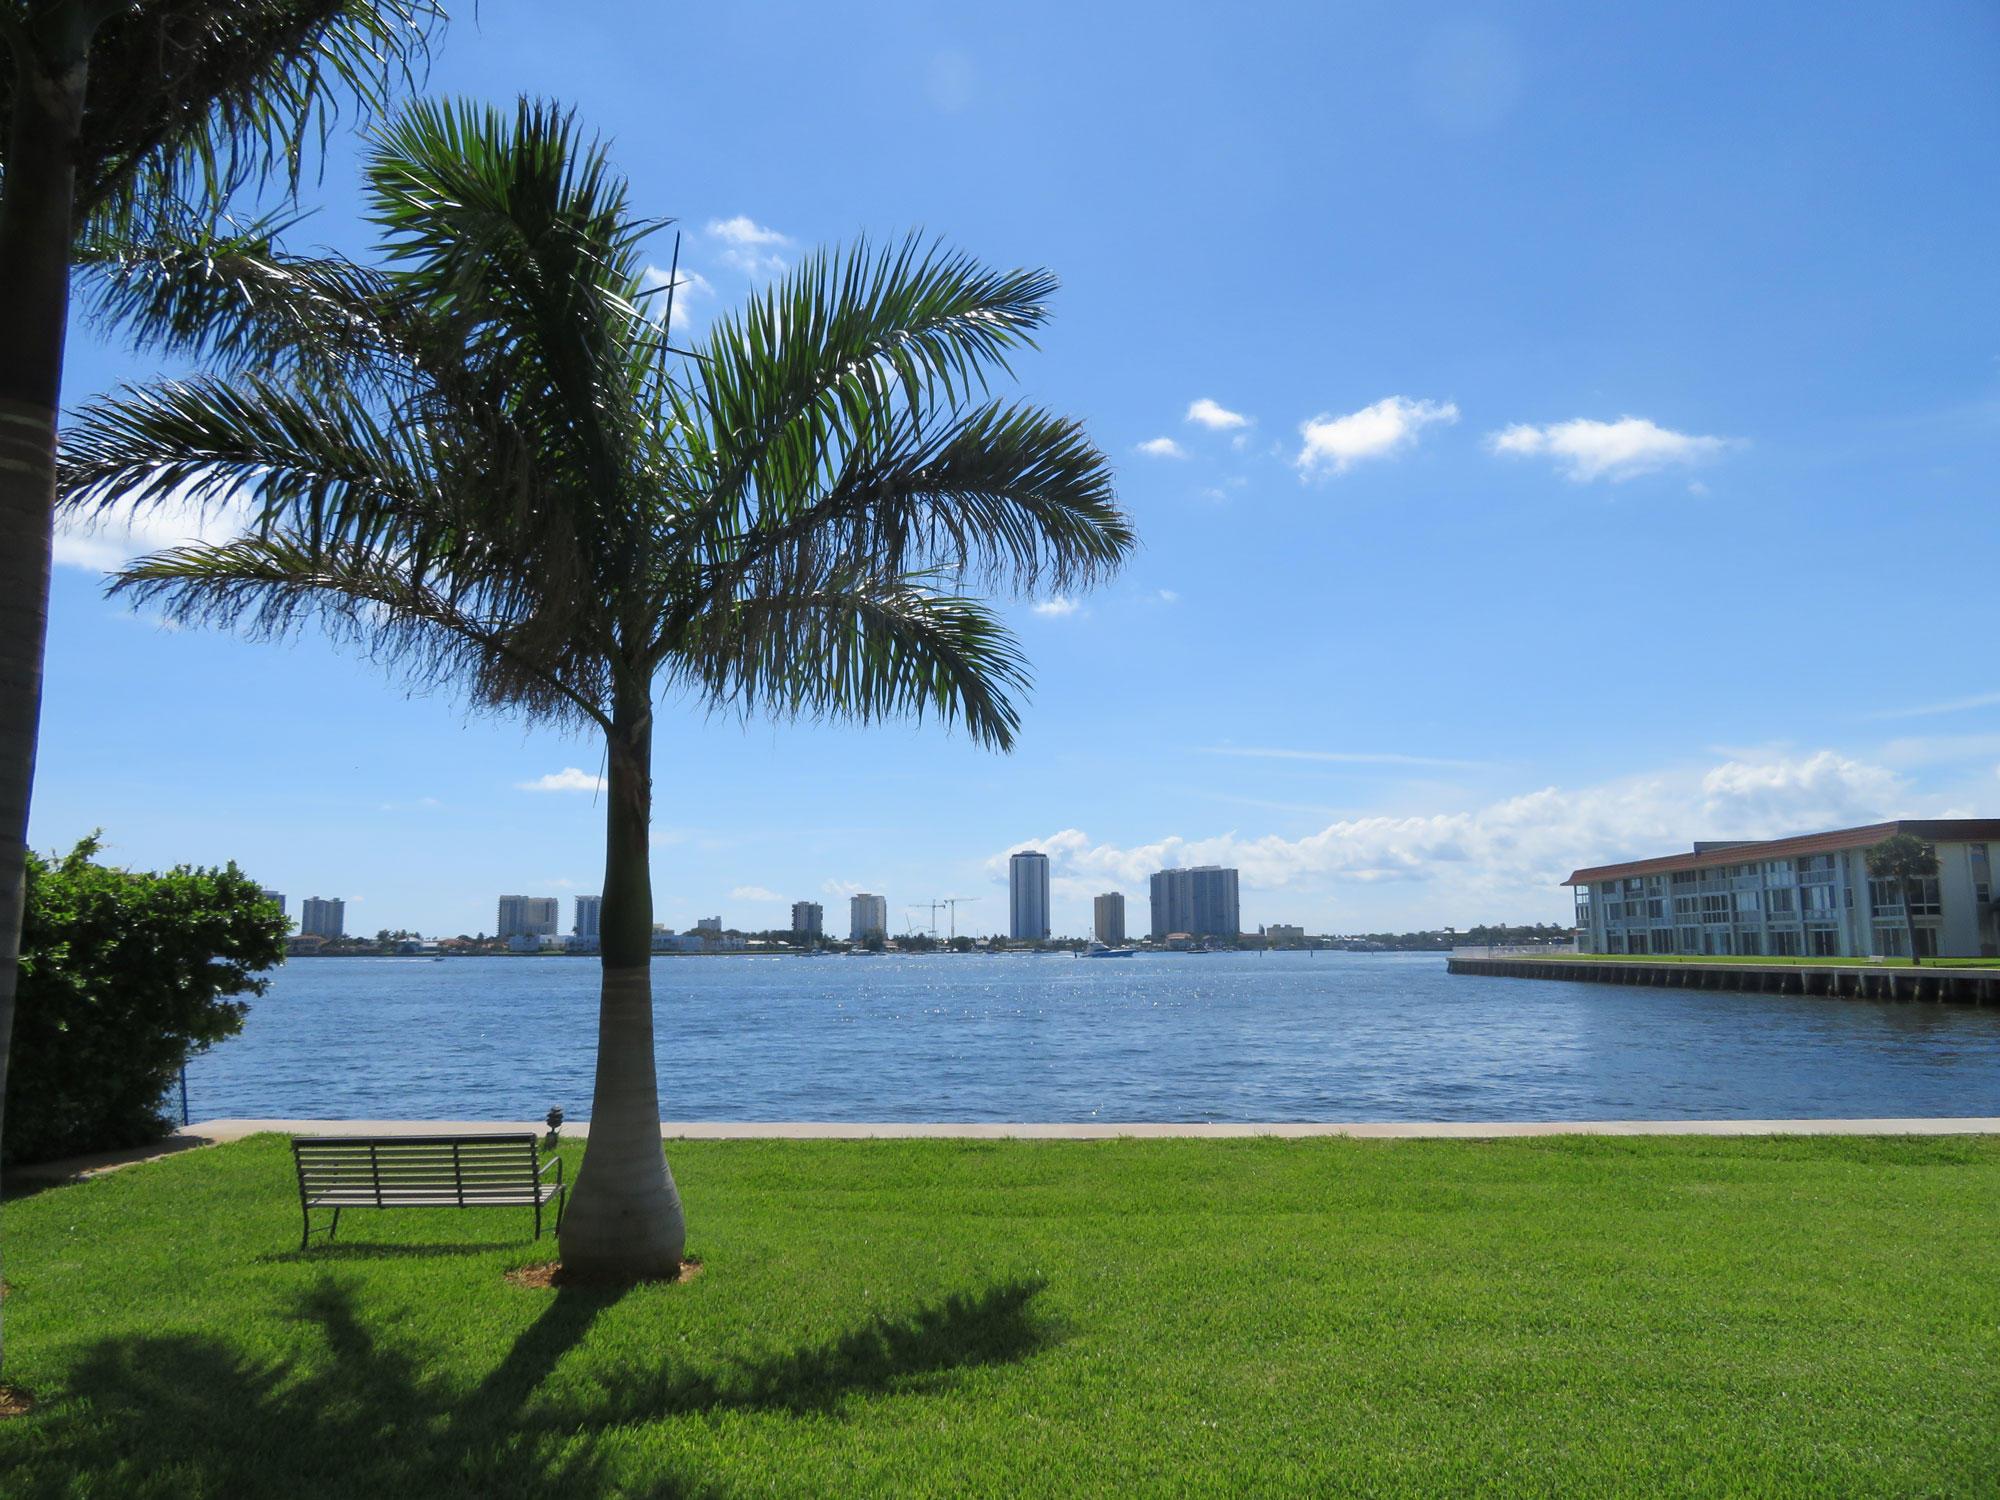 2936 Lake Shore Drive #202 - 33404 - FL - Riviera Beach